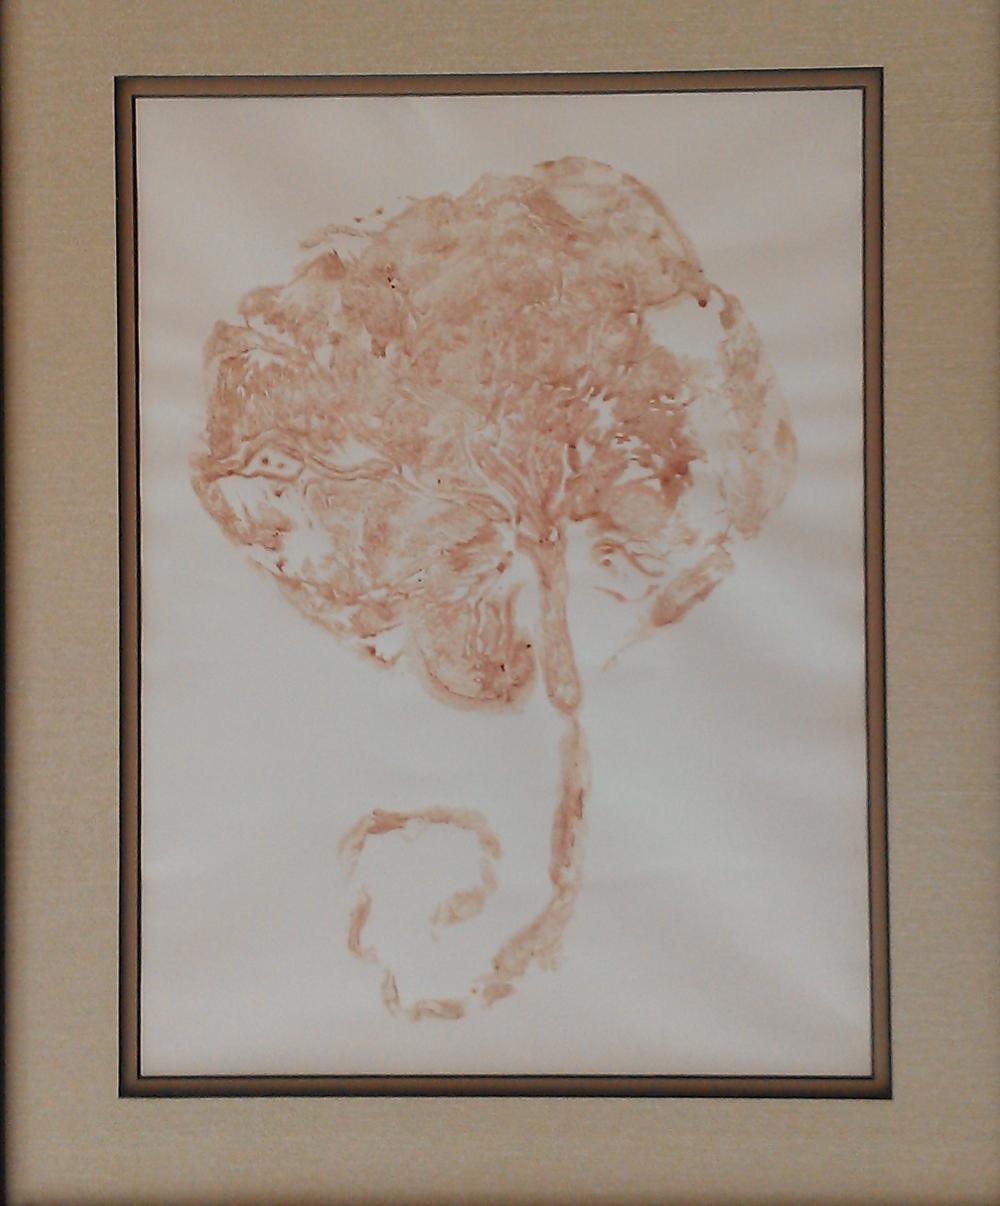 Placenta encapsulation in Gresham, Porltand Oregon